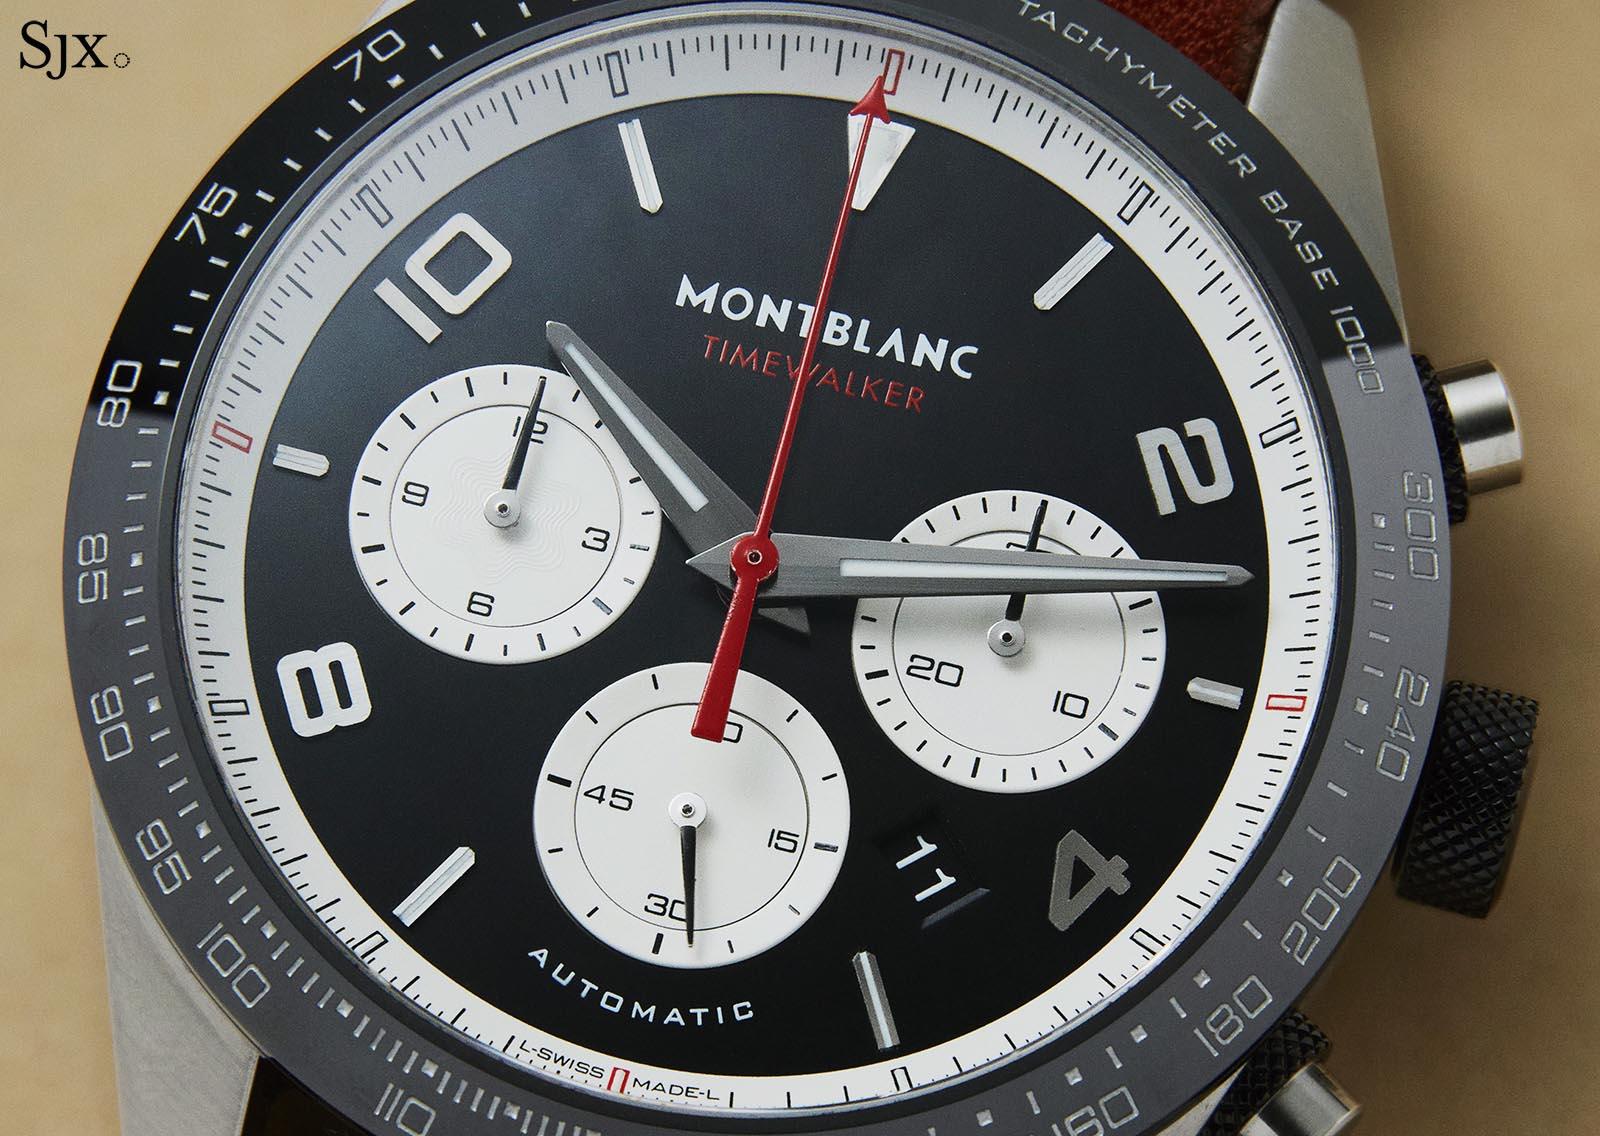 Monblanc Reverse Panda TimeWalker Manufacture Chronograph 7